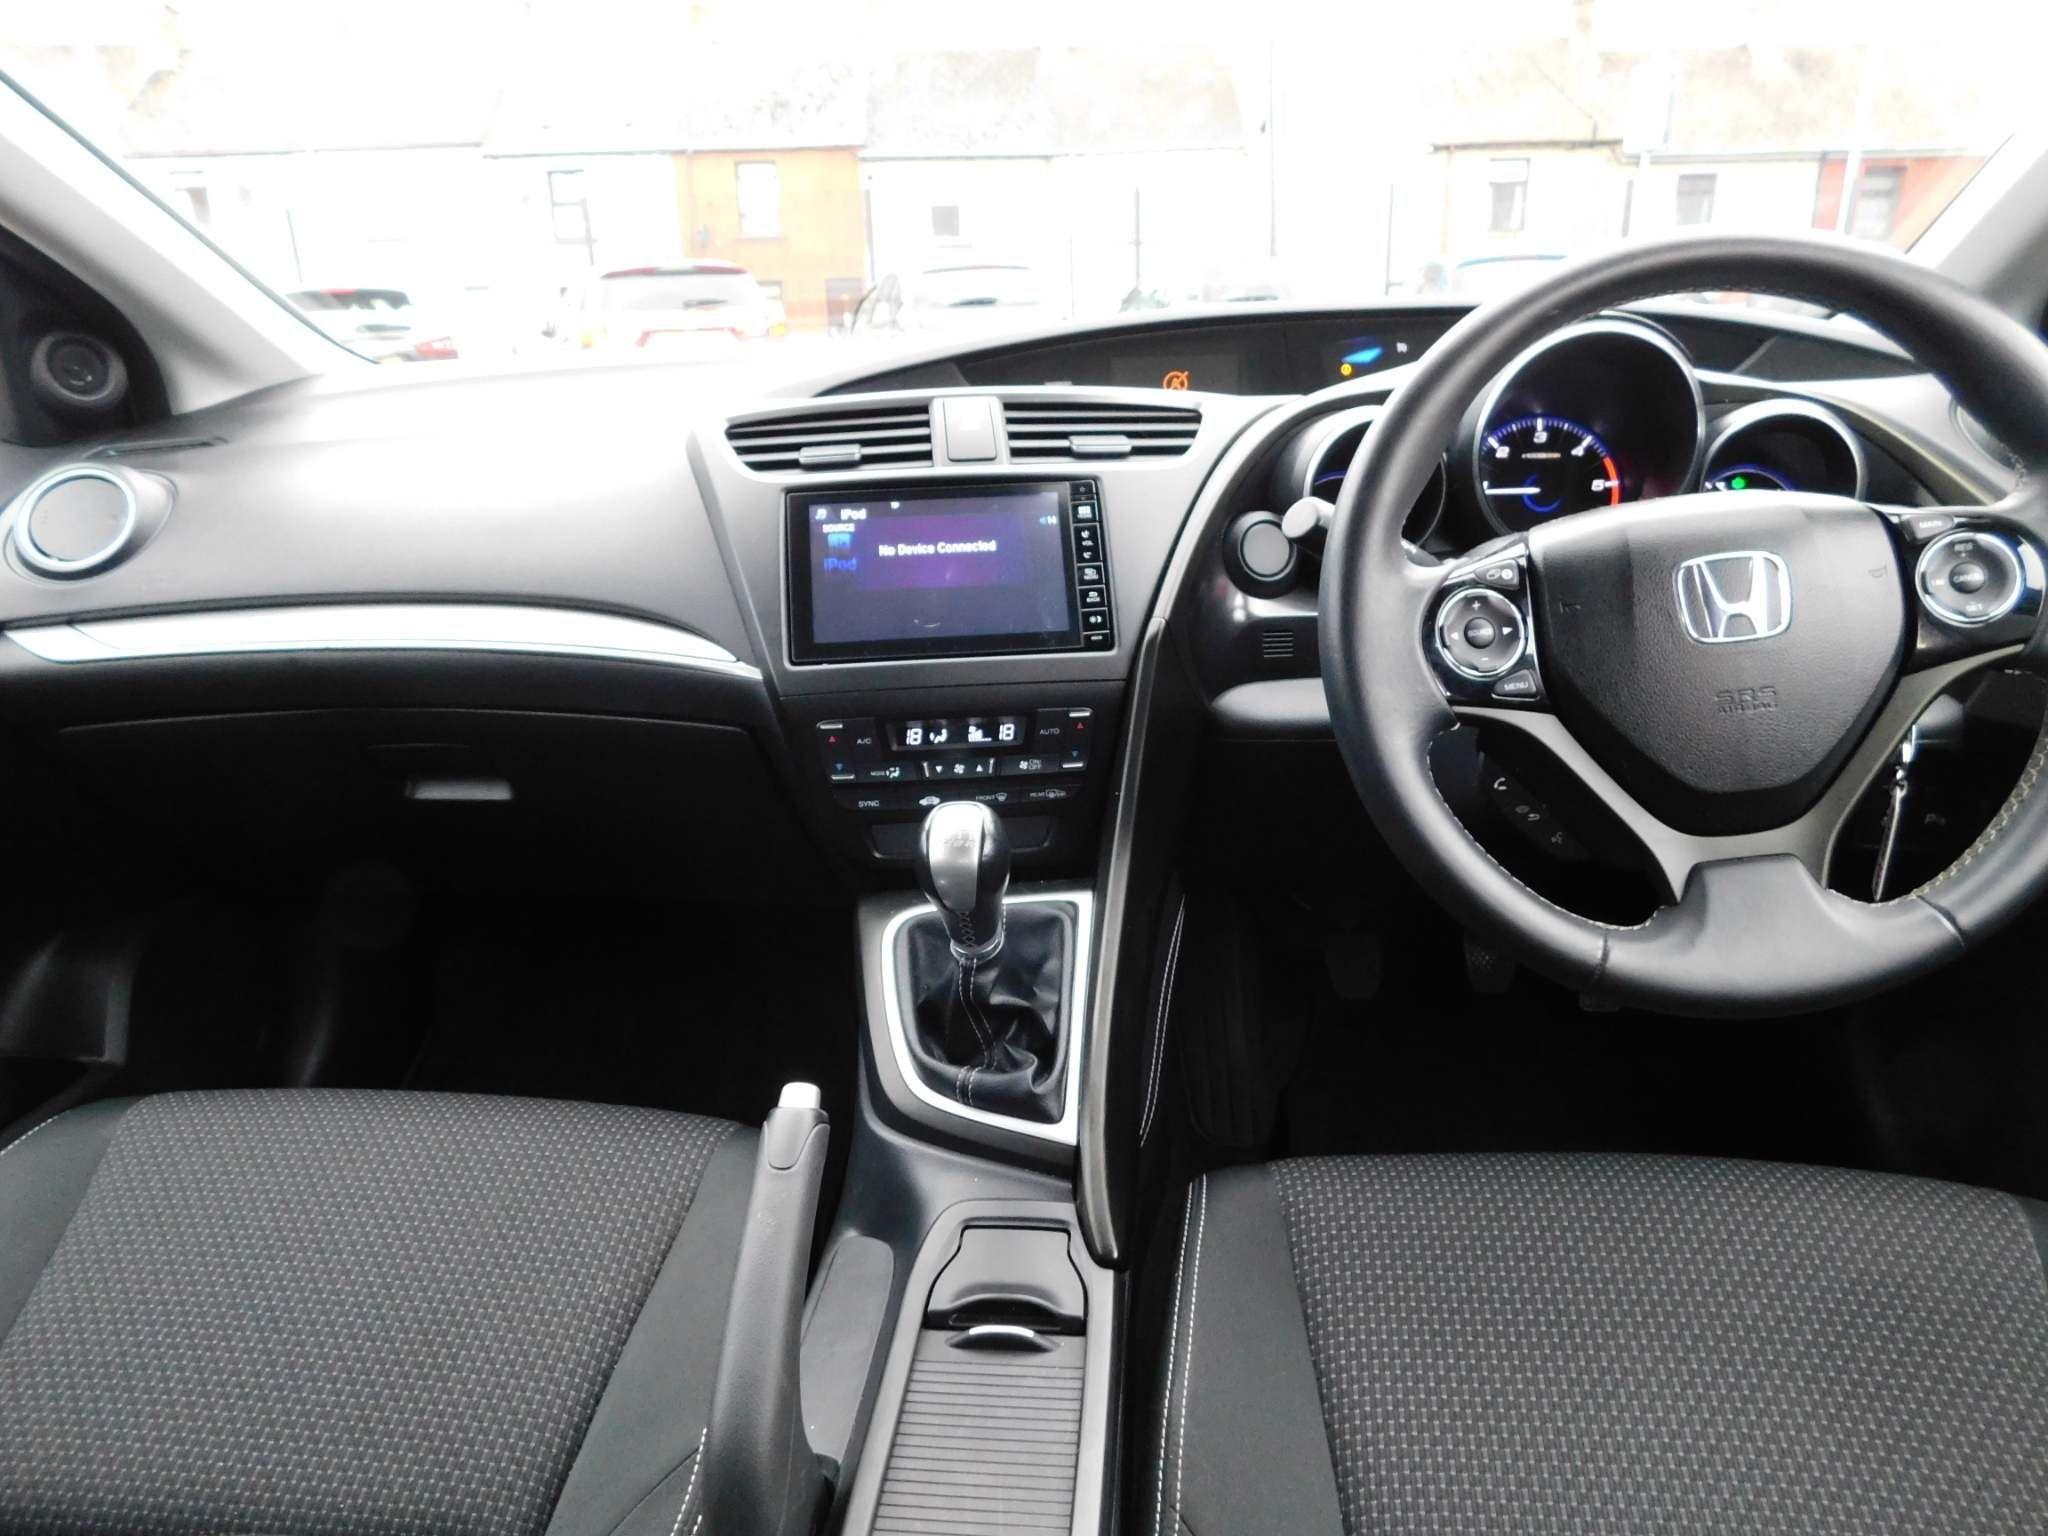 2015 HONDA Civic 1.6 i-DTEC SE Plus (s/s) Diesel Manual reverse camera,fsh – Meadow Cars Carrickfergus full